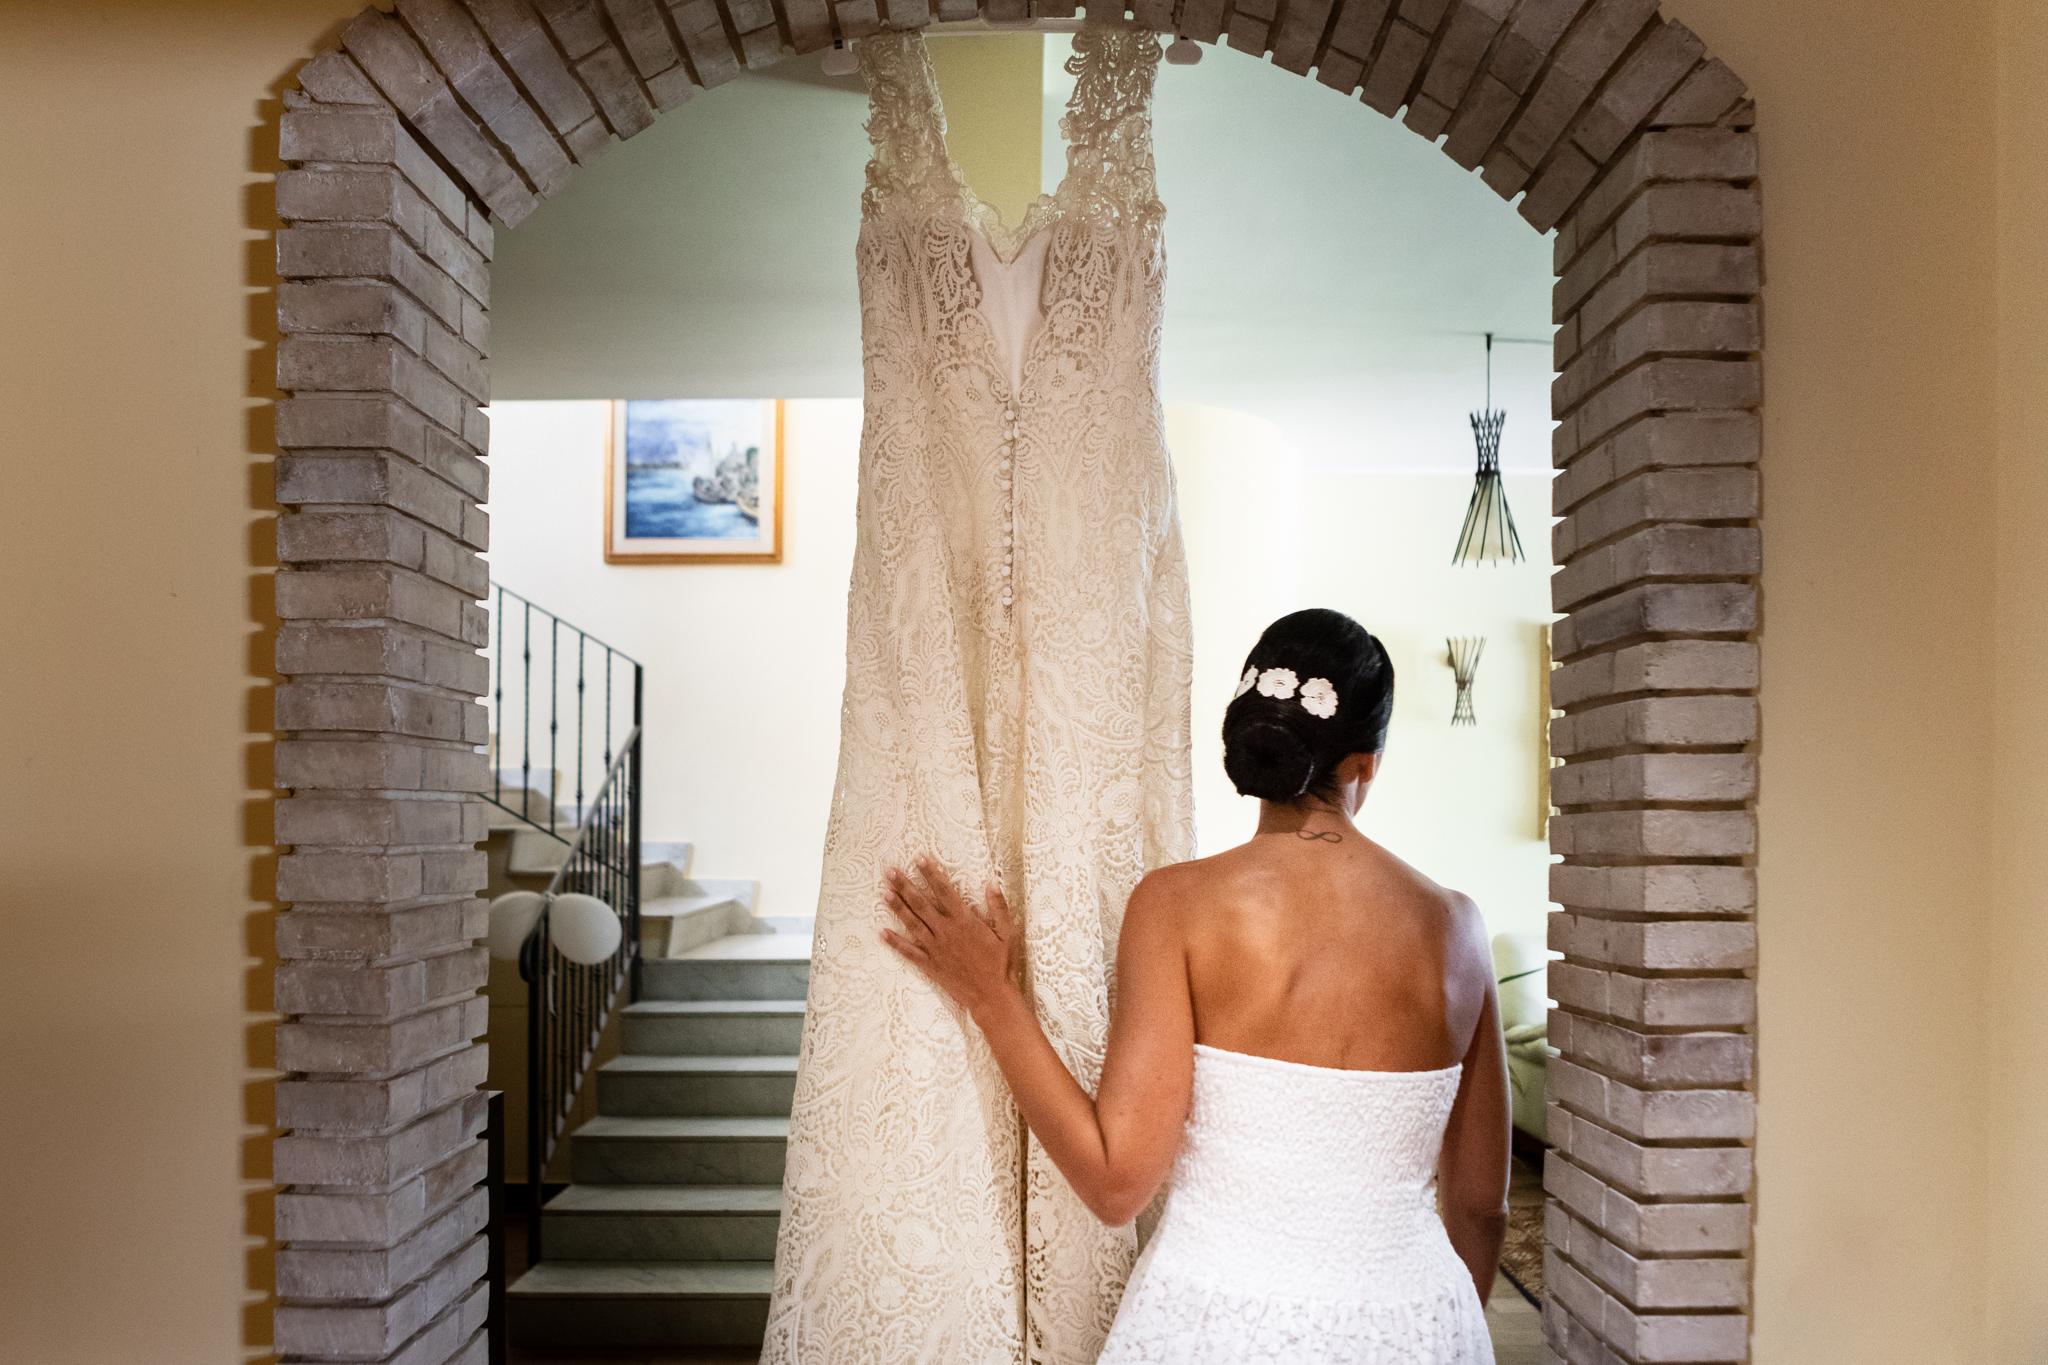 Best-wedding-photographer-in-Sicily- Catania-4.jpg